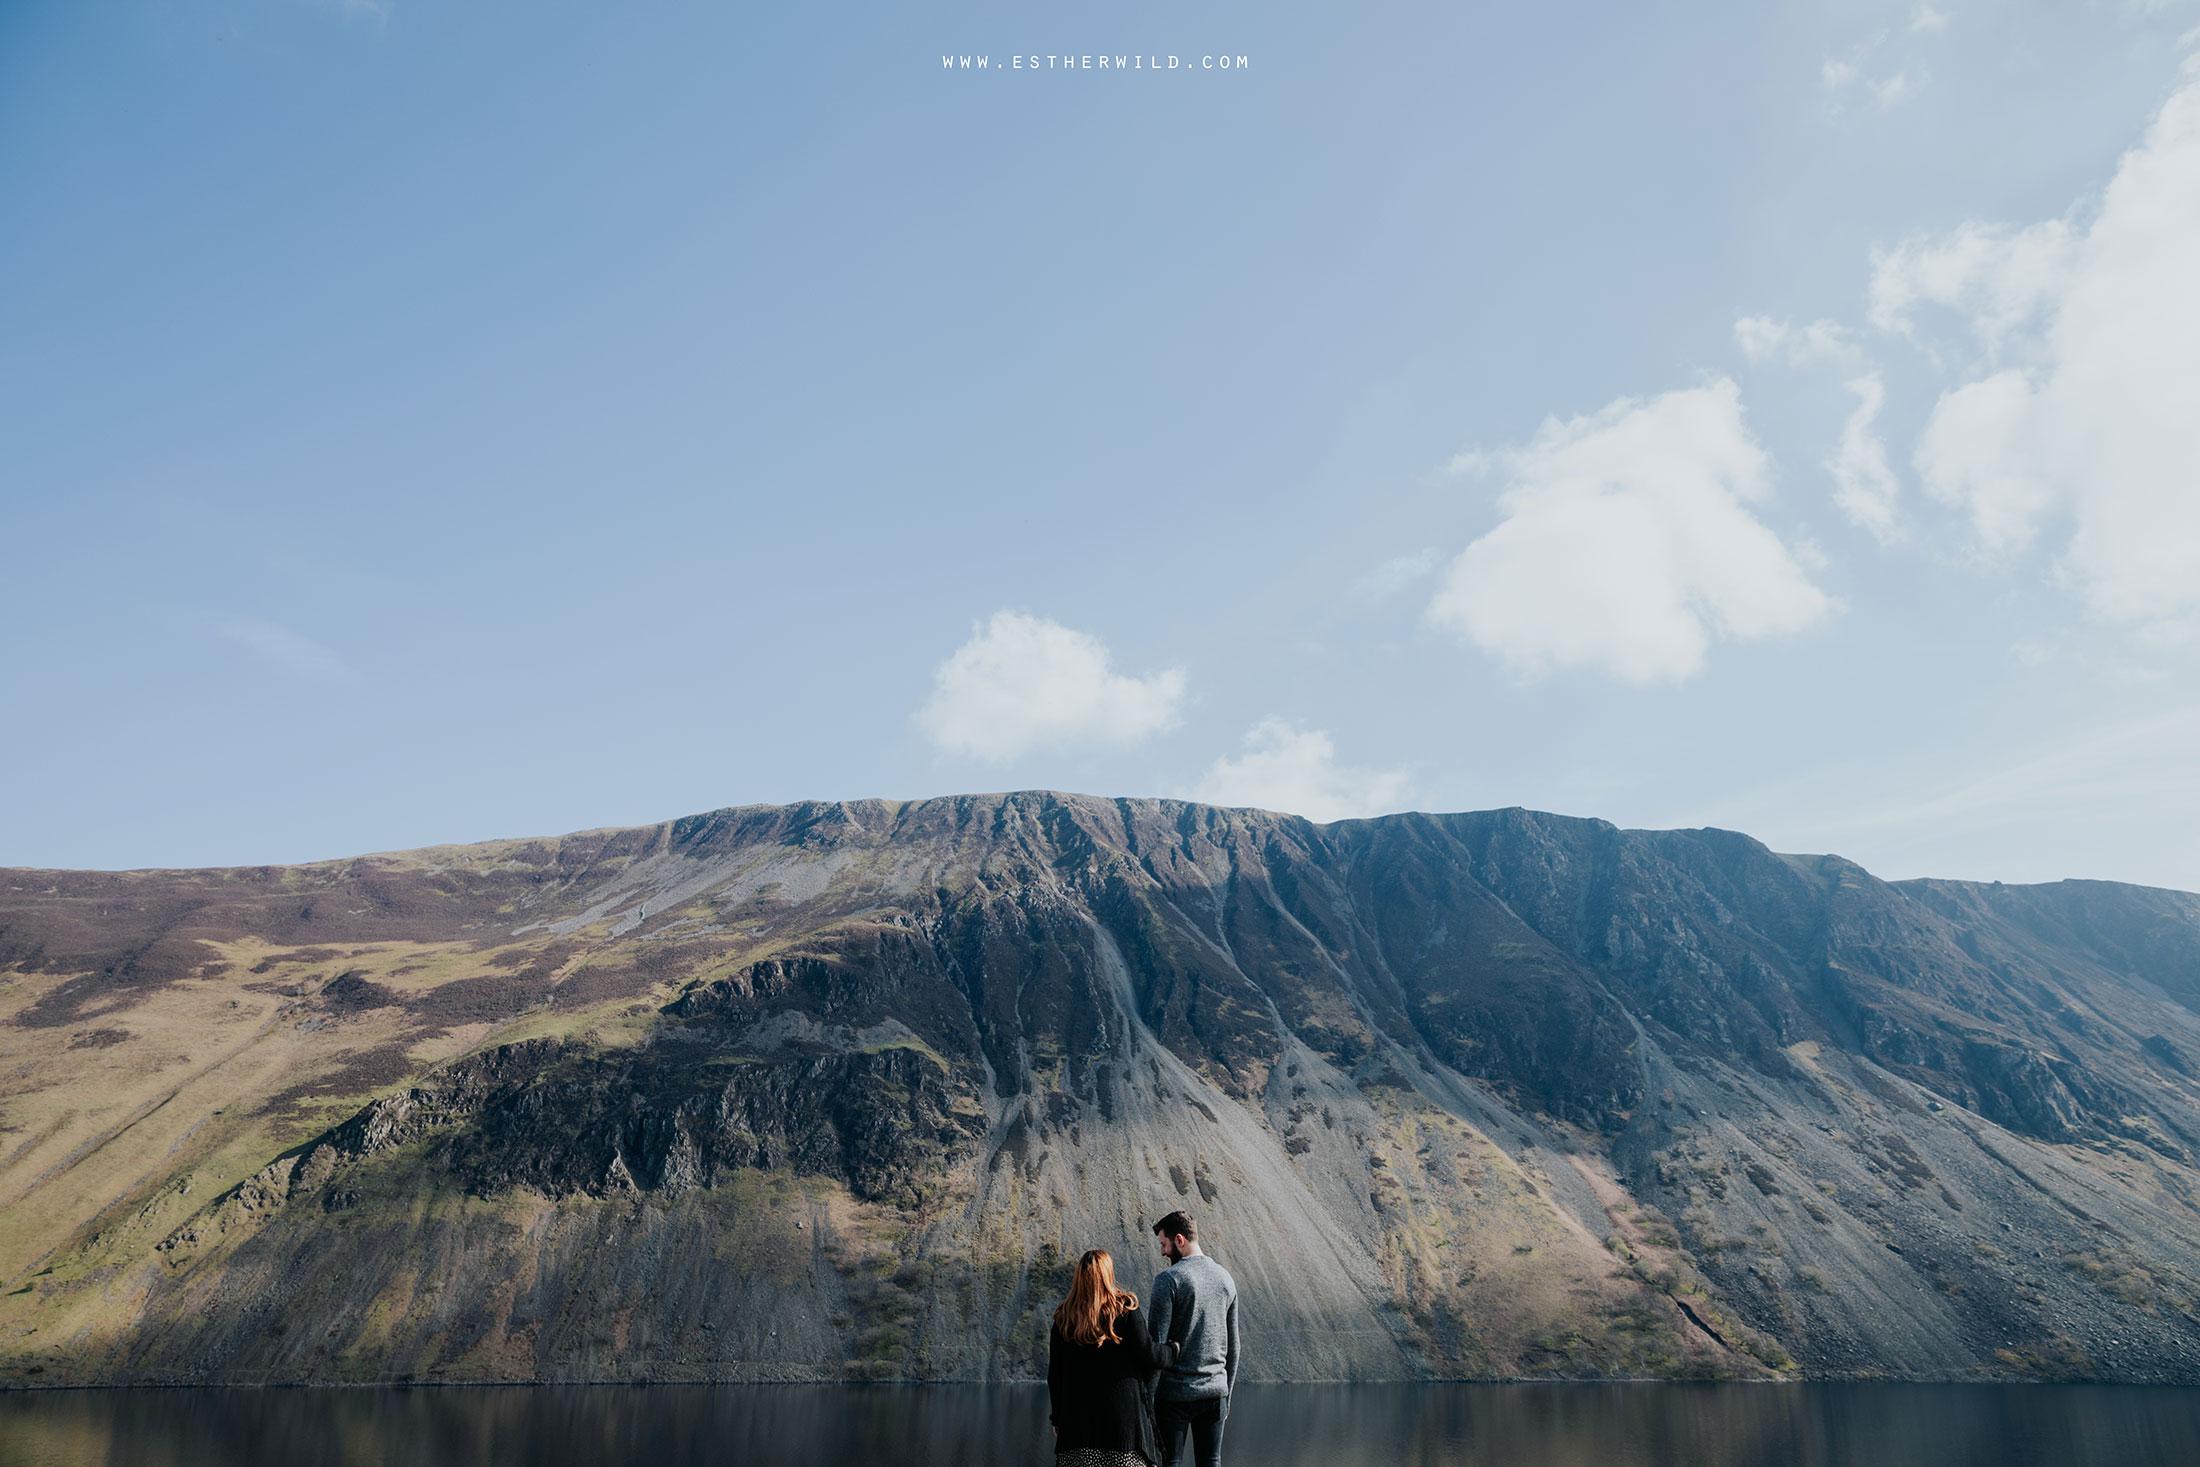 Cumbria_Lake_District_Wasdale_Wedding_Photographer_Destination_Engagement_Anniversary_Esther_Wild_IMG_3198.jpg